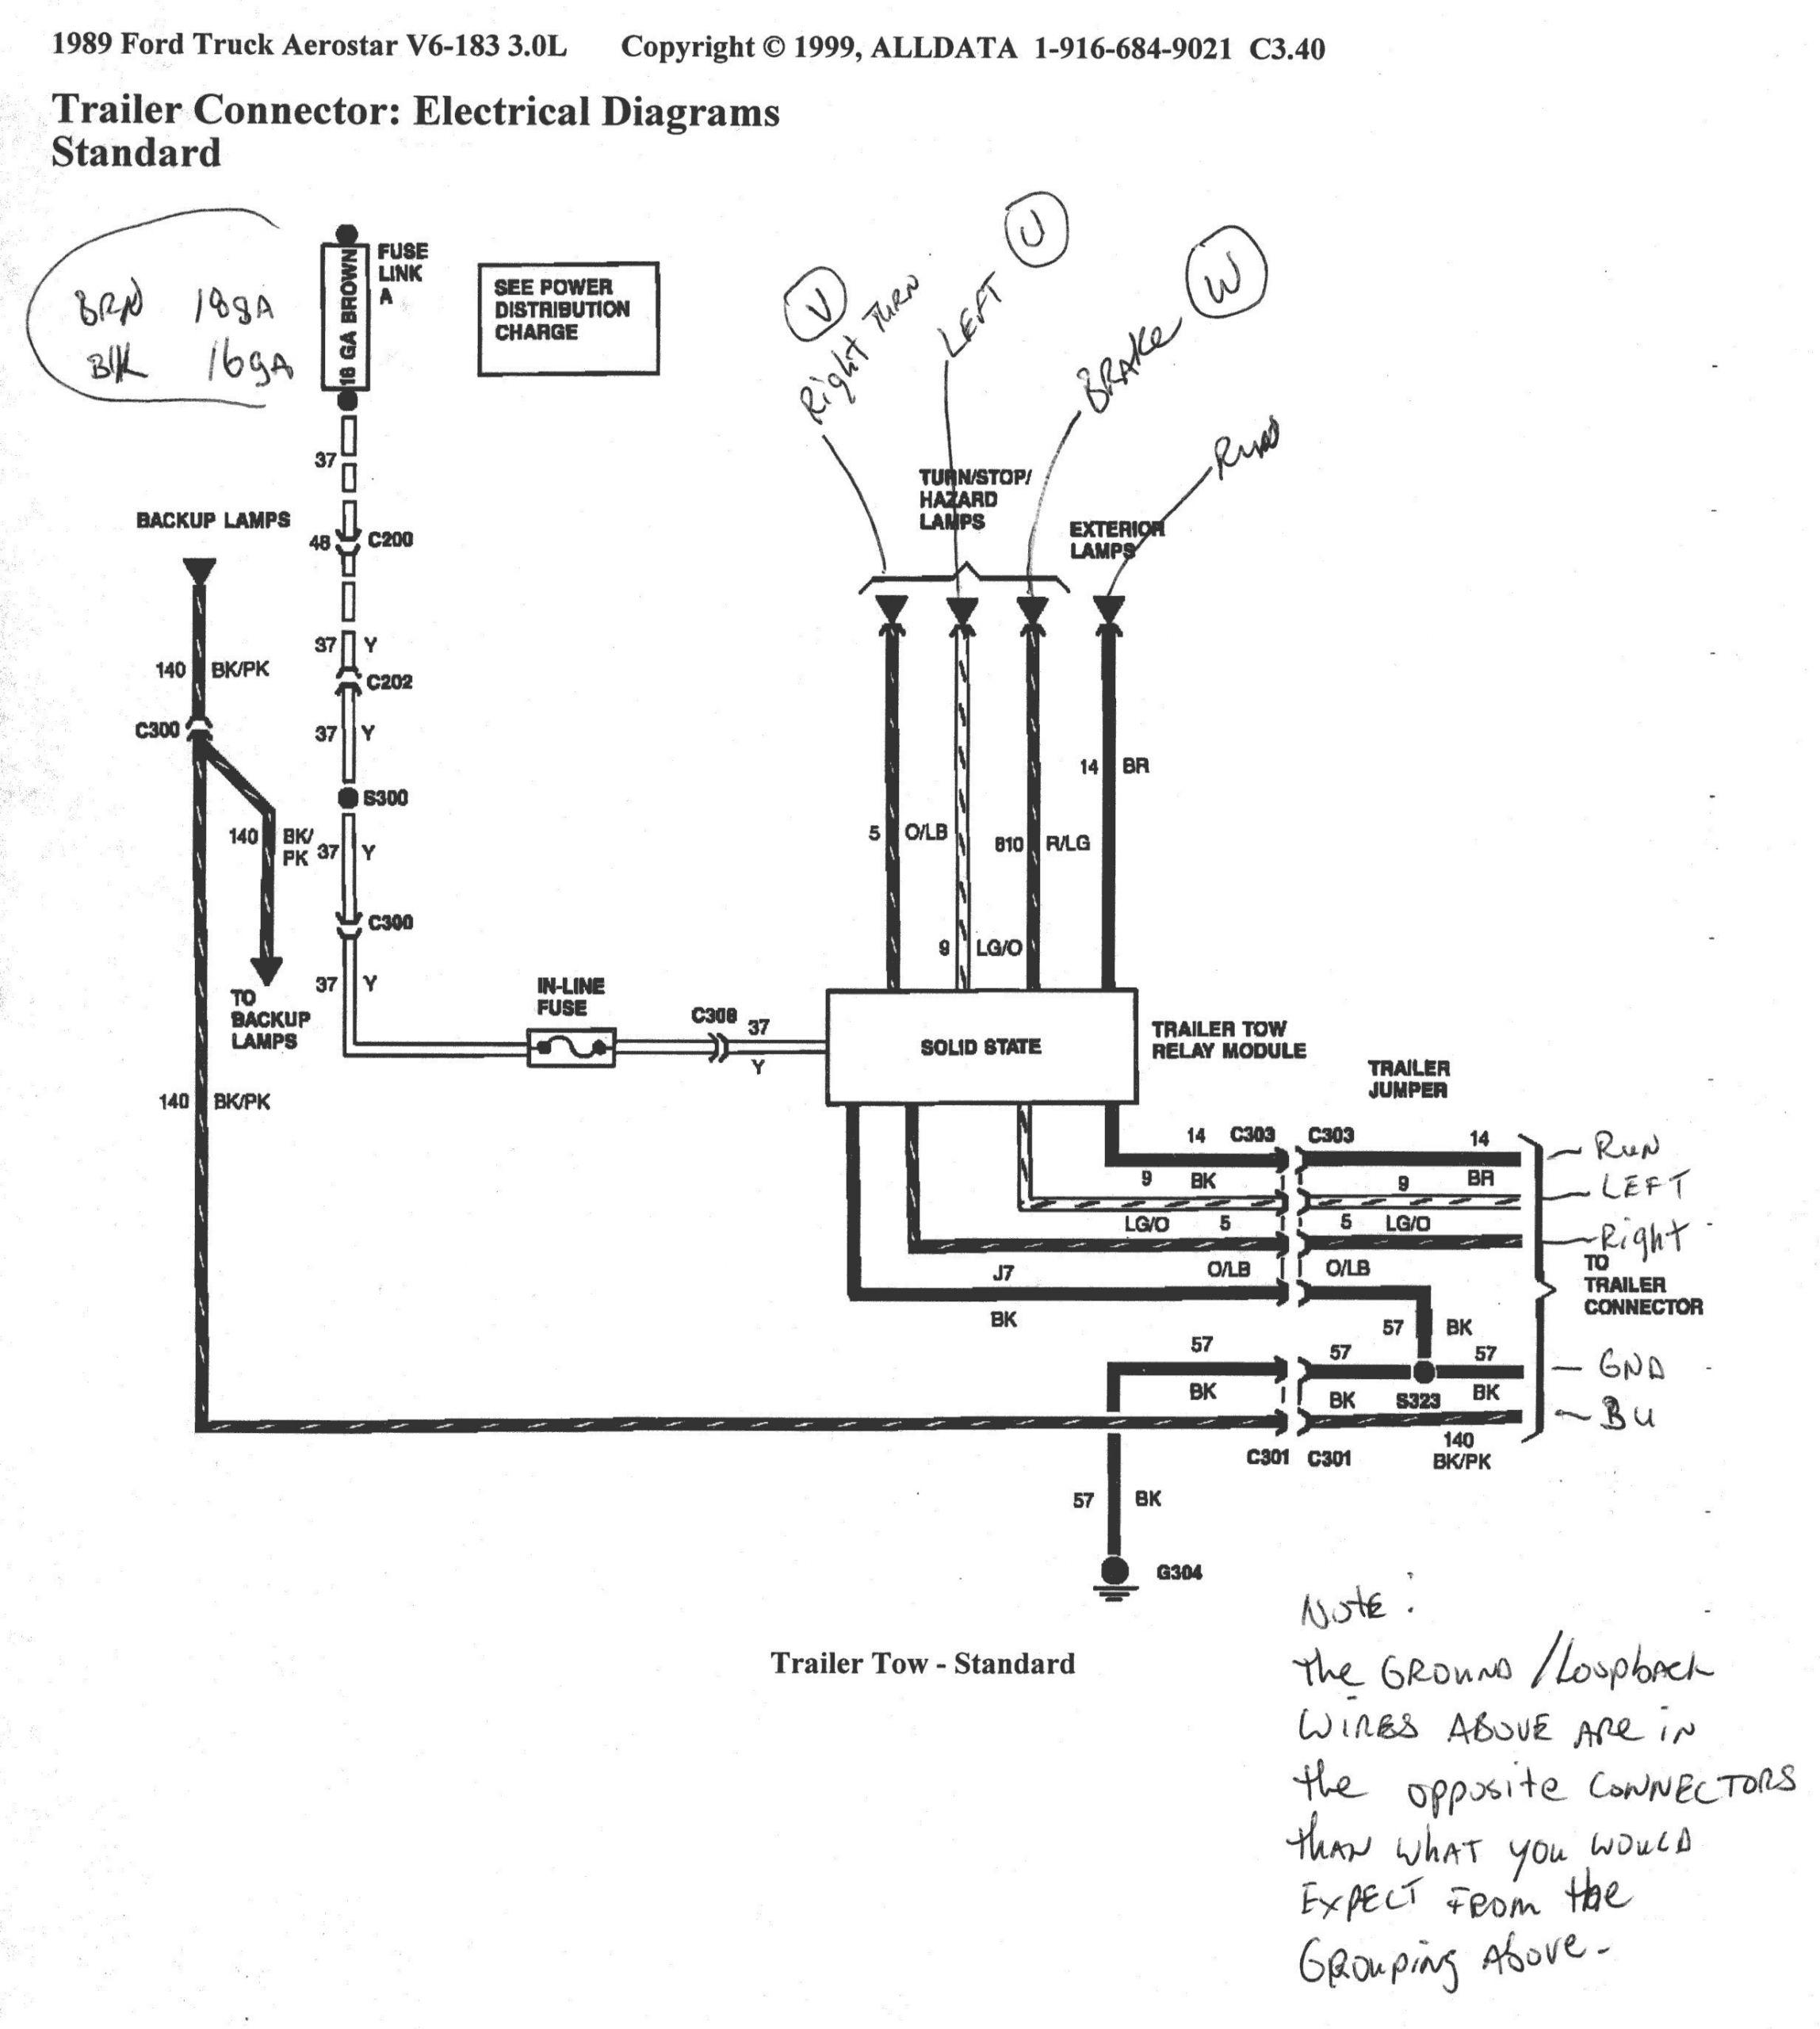 2005 F350 Tail Light Wiring Diagram 2000 ford F350 Tail Light Wiring Diagram Of 2005 F350 Tail Light Wiring Diagram